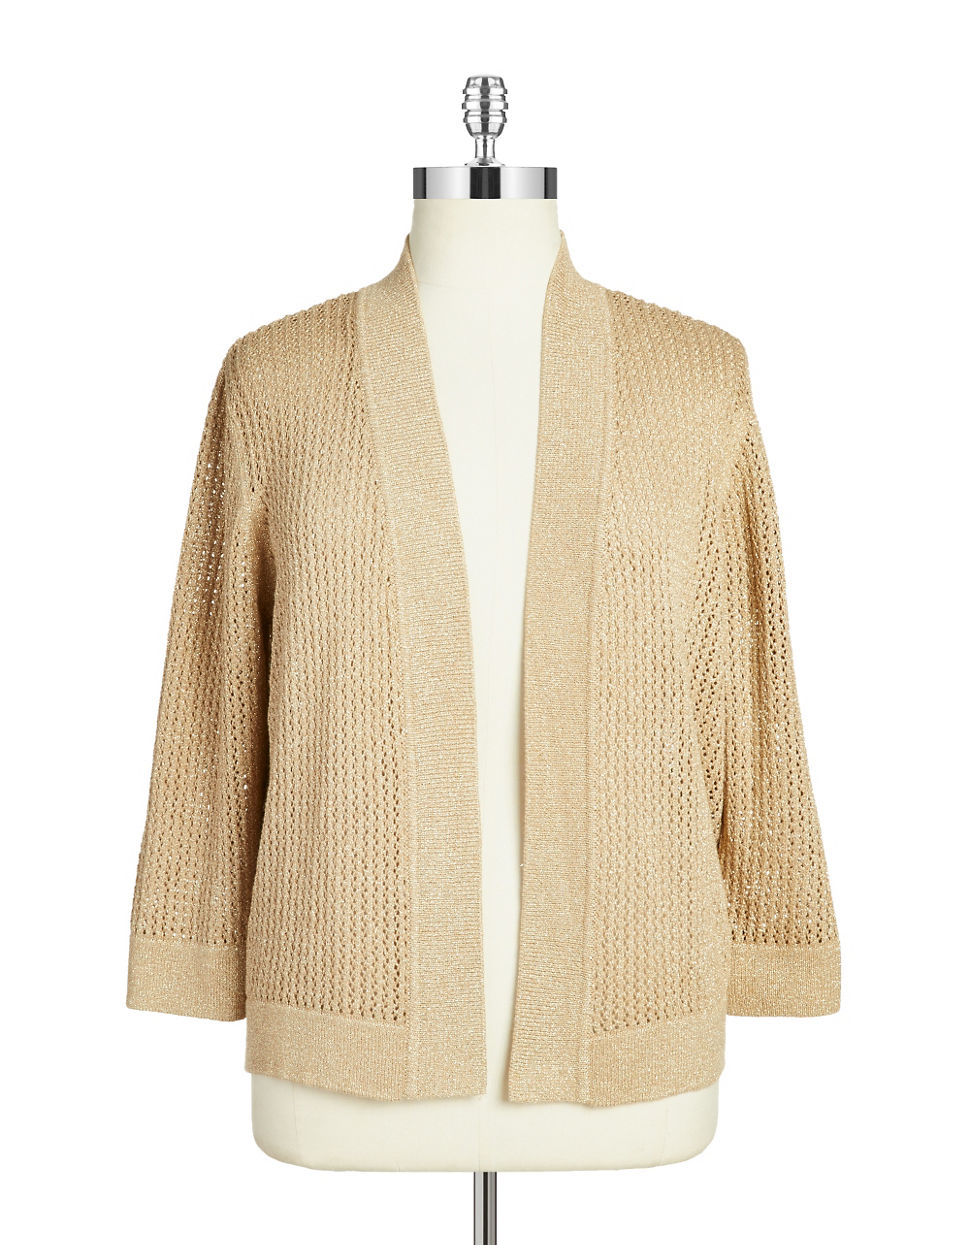 Nipon boutique Plus Metallic Open-front Cardigan in Natural | Lyst